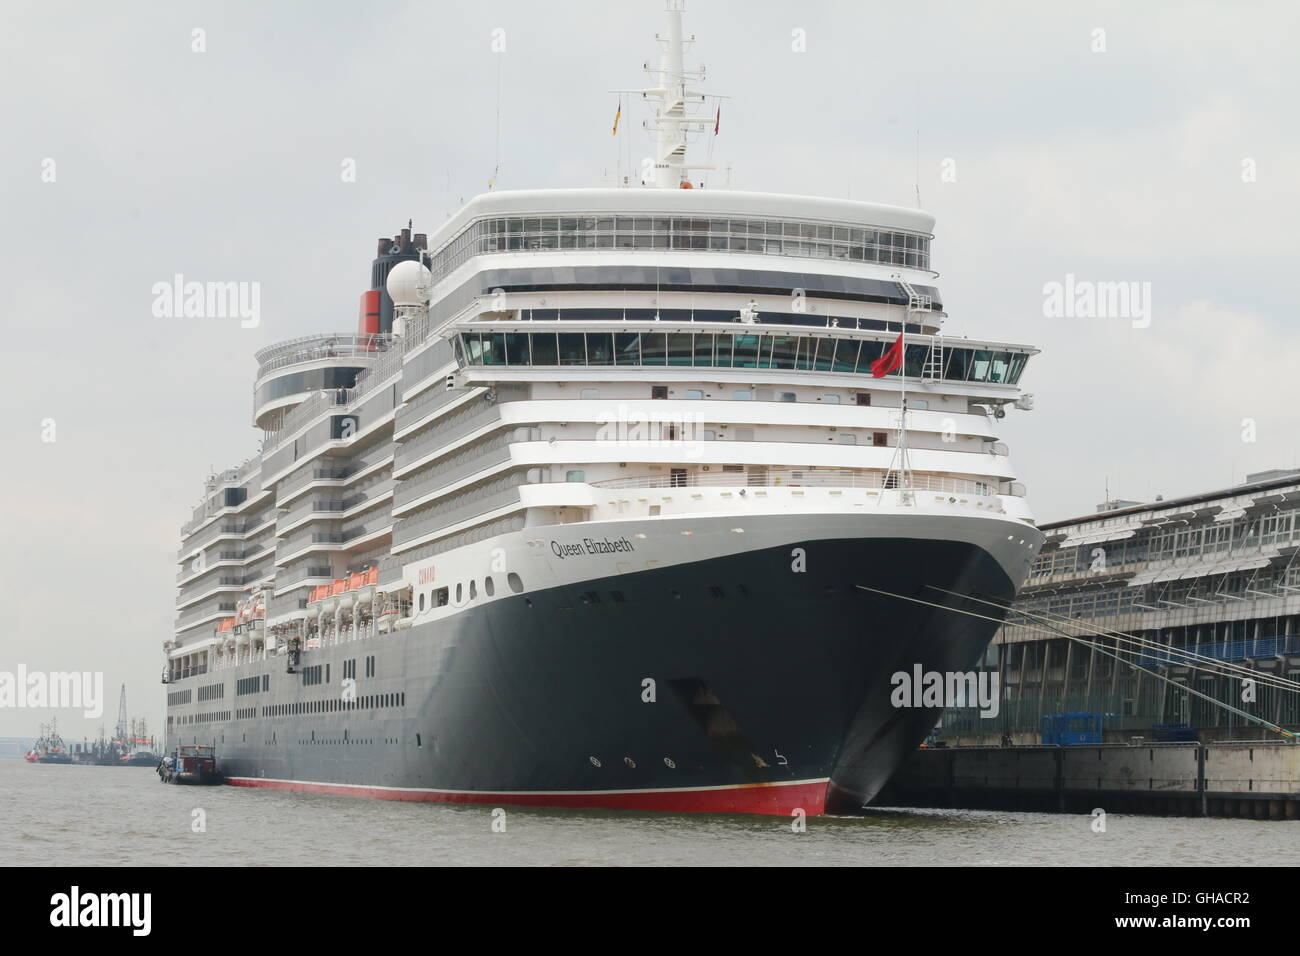 Cunard Cruise Ship Queen Elizabeth junto en Hamburgo, Alemania. Imagen De Stock